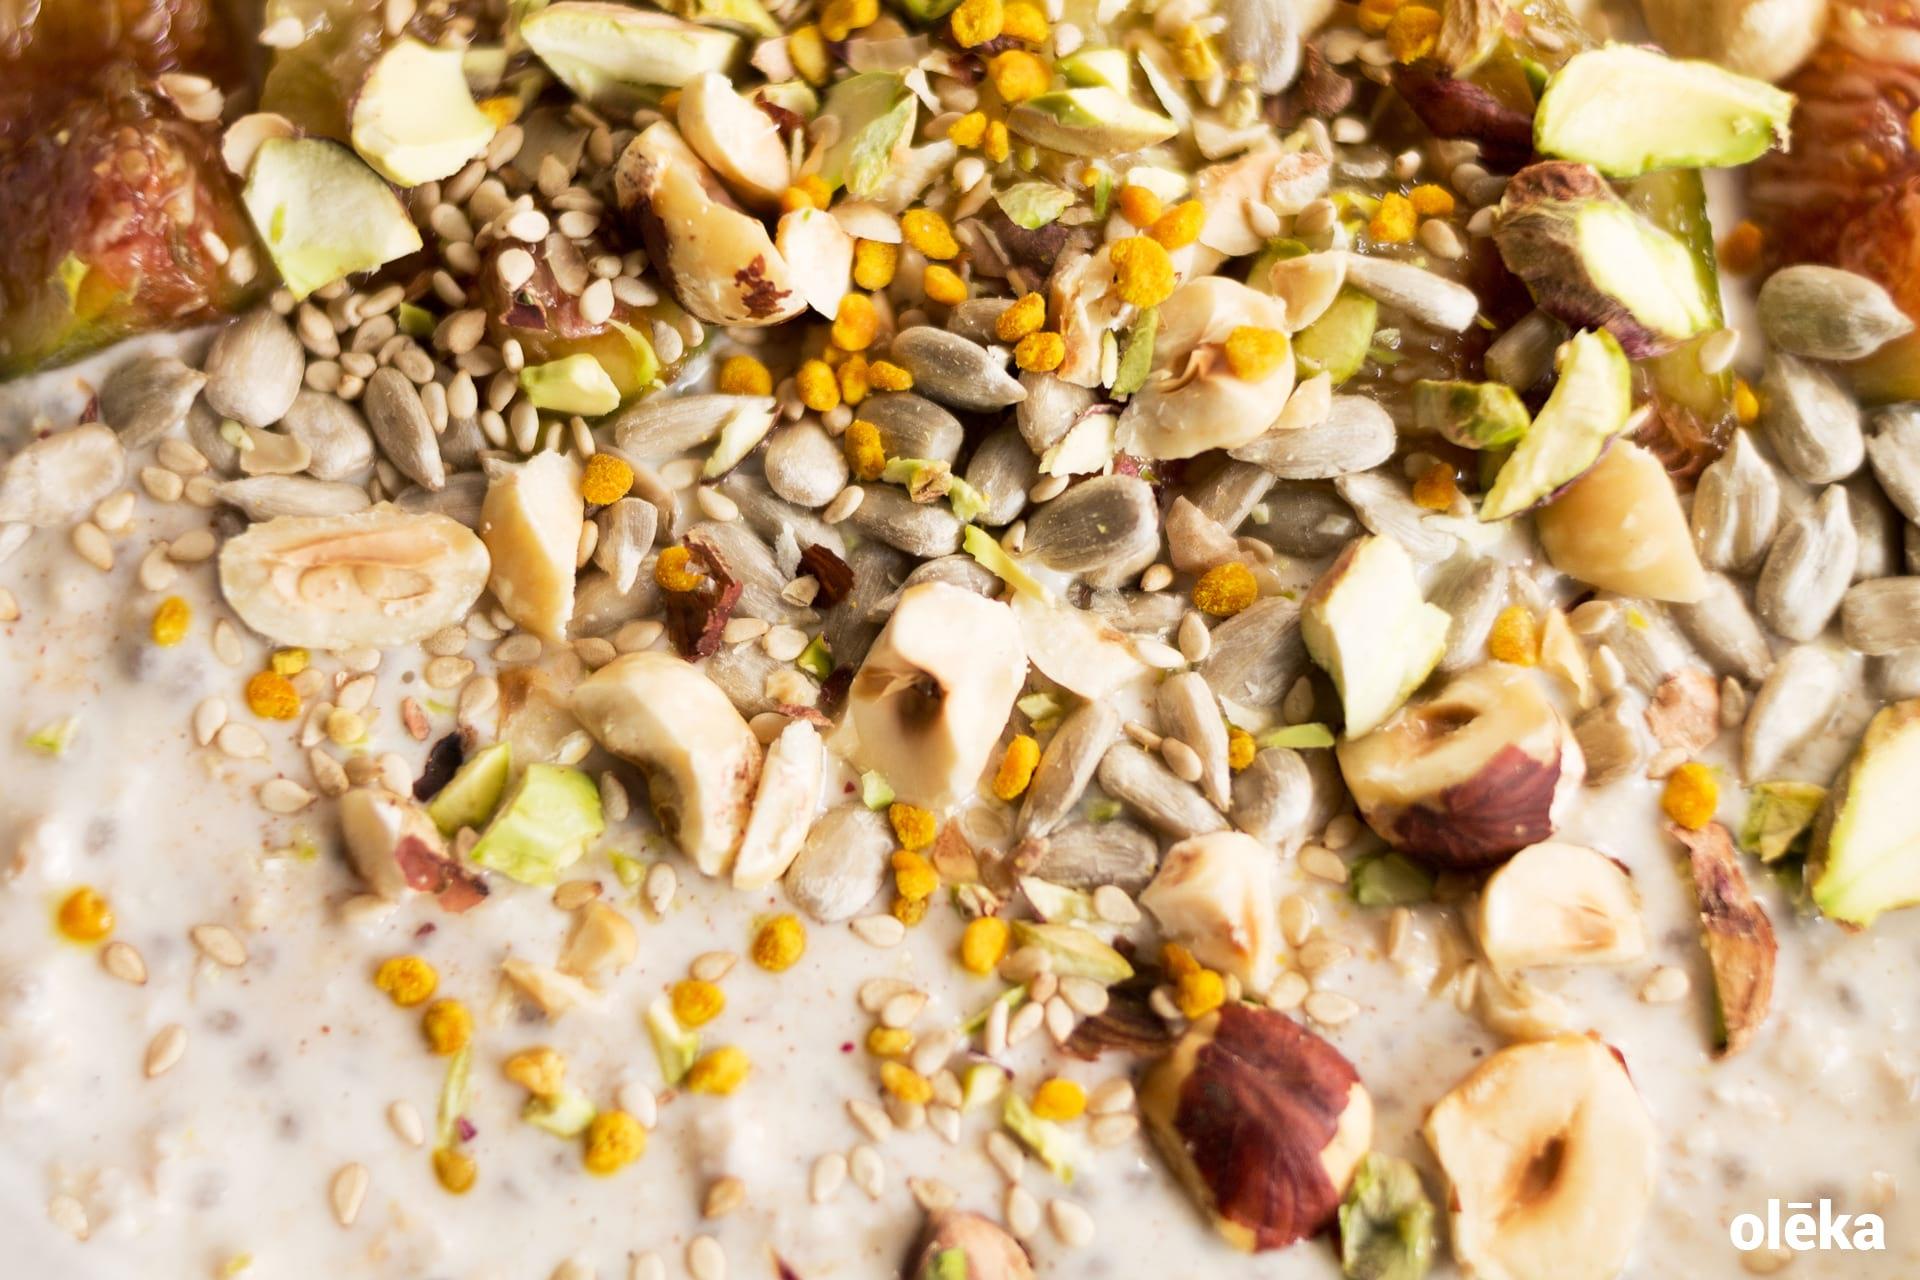 desayuno overnight oats con frutos secos